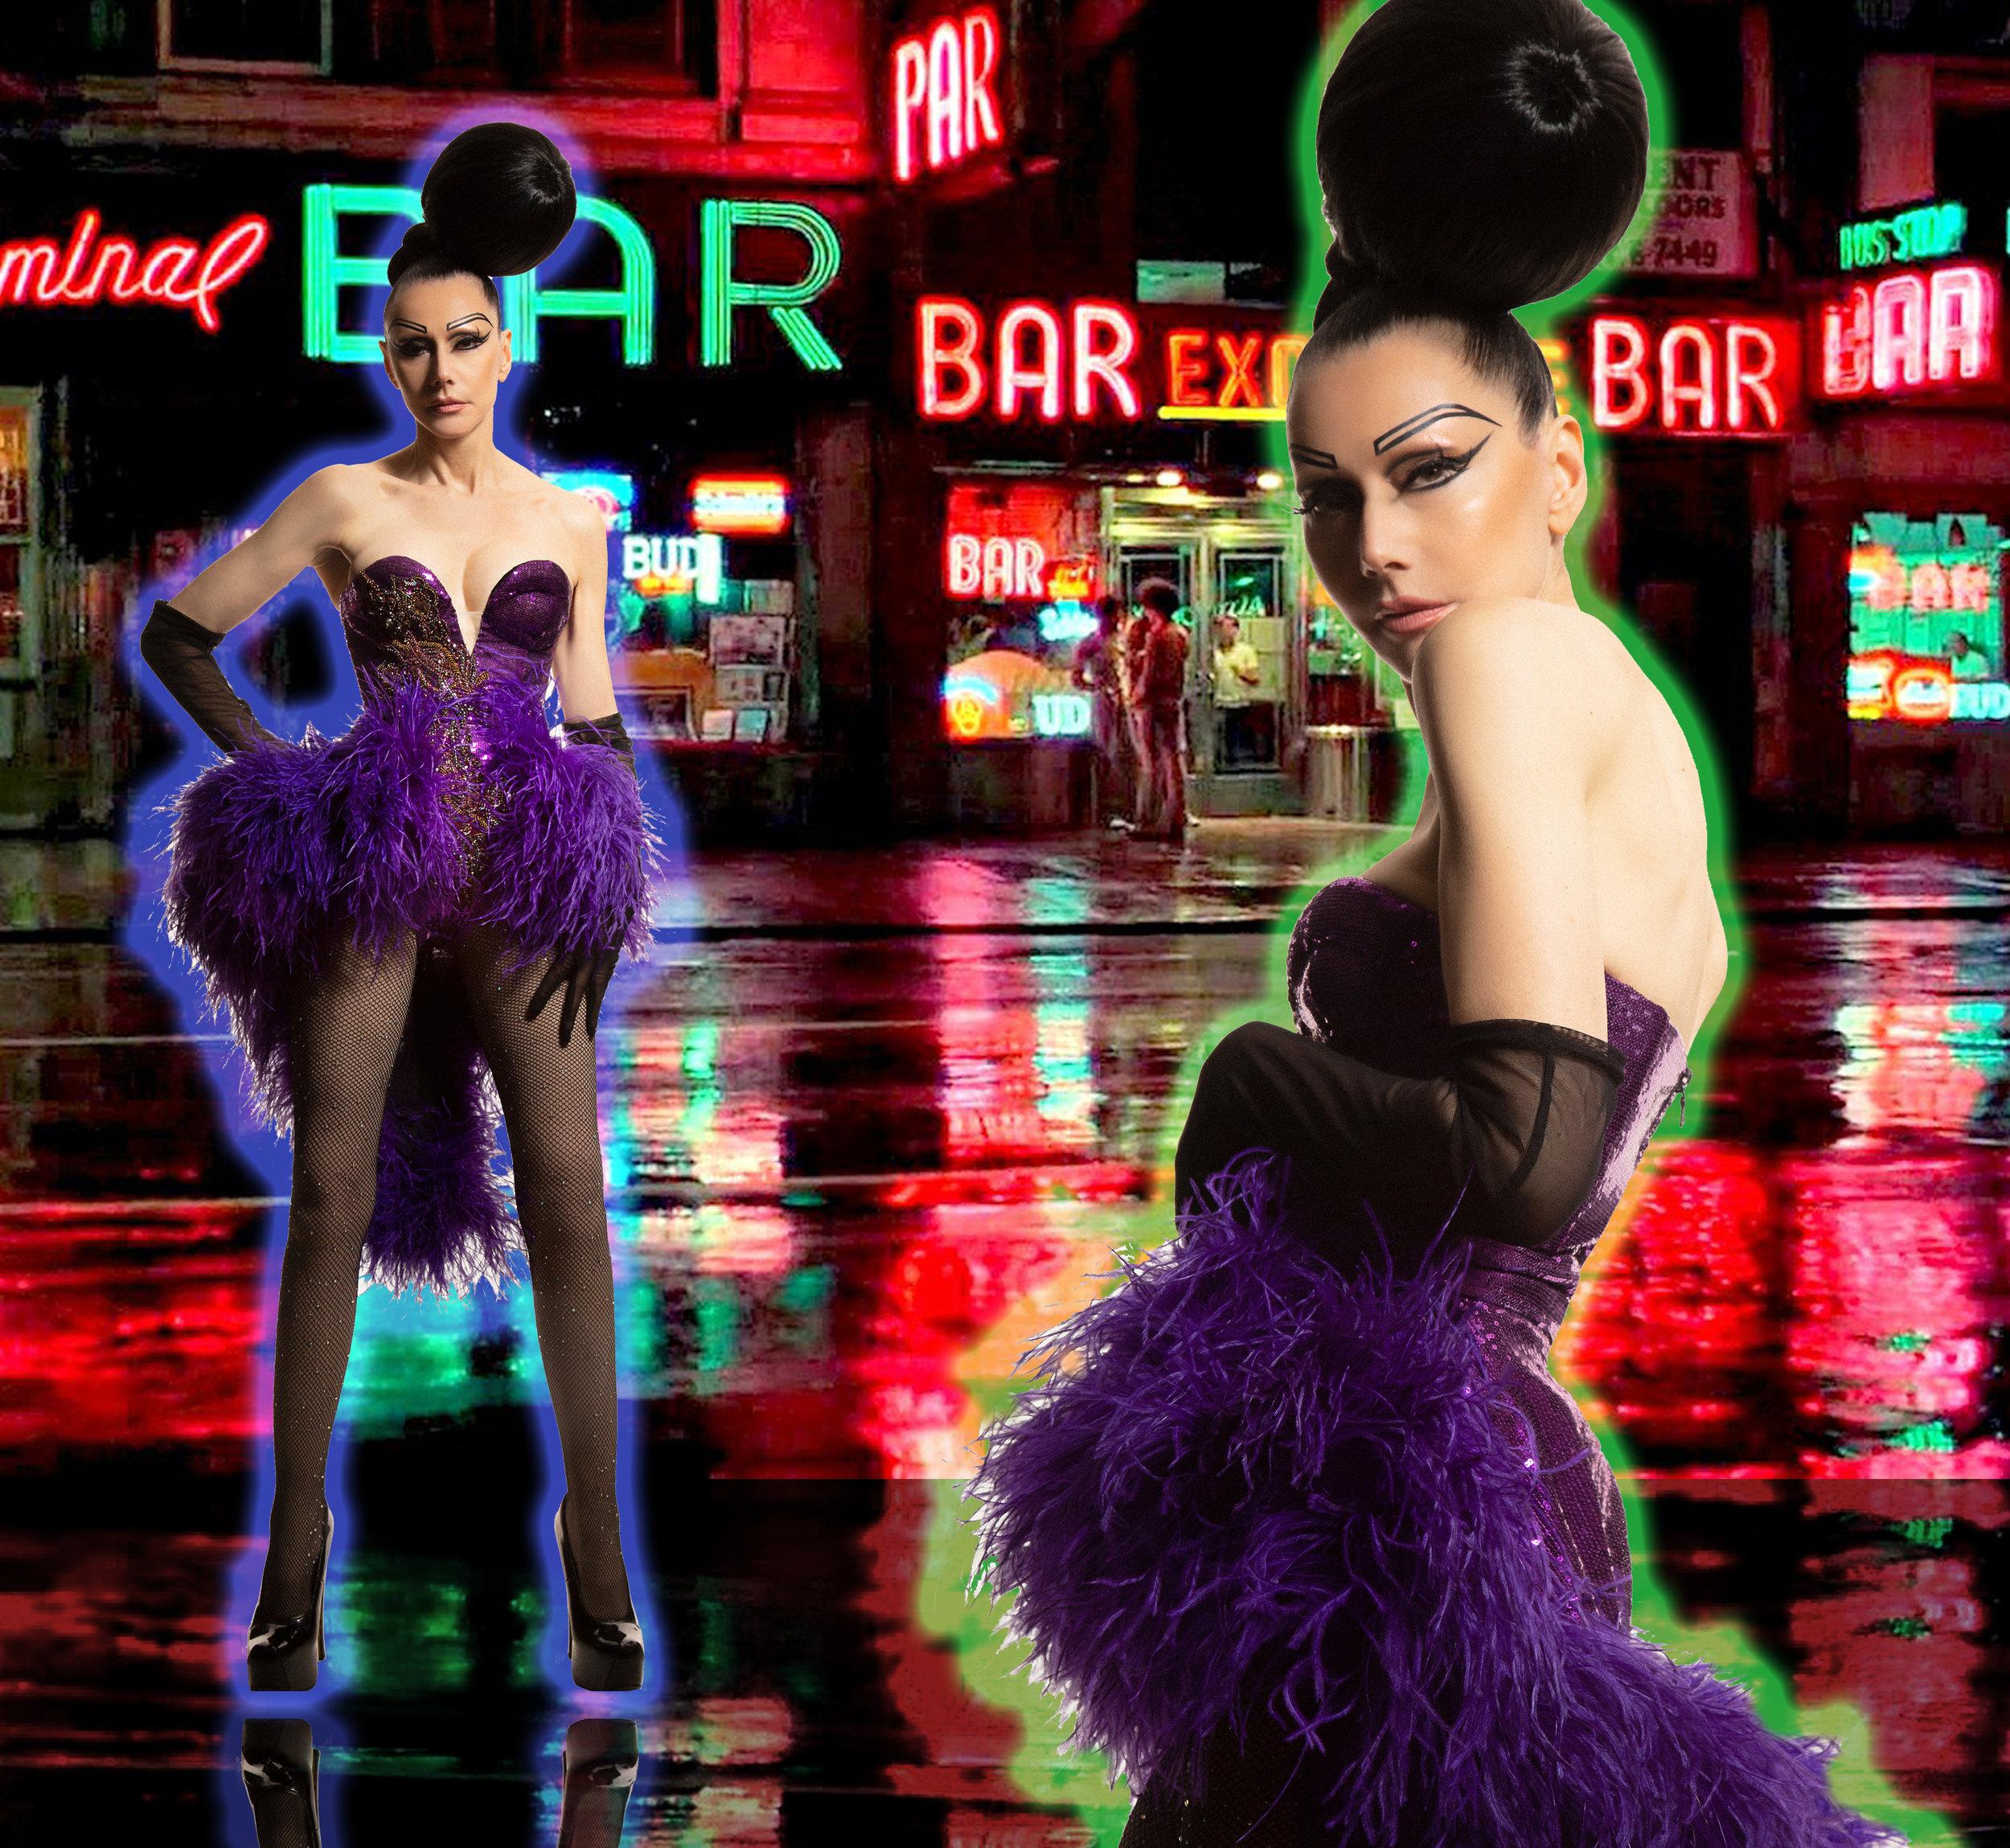 7 Purple Feather hem Dress.jpg